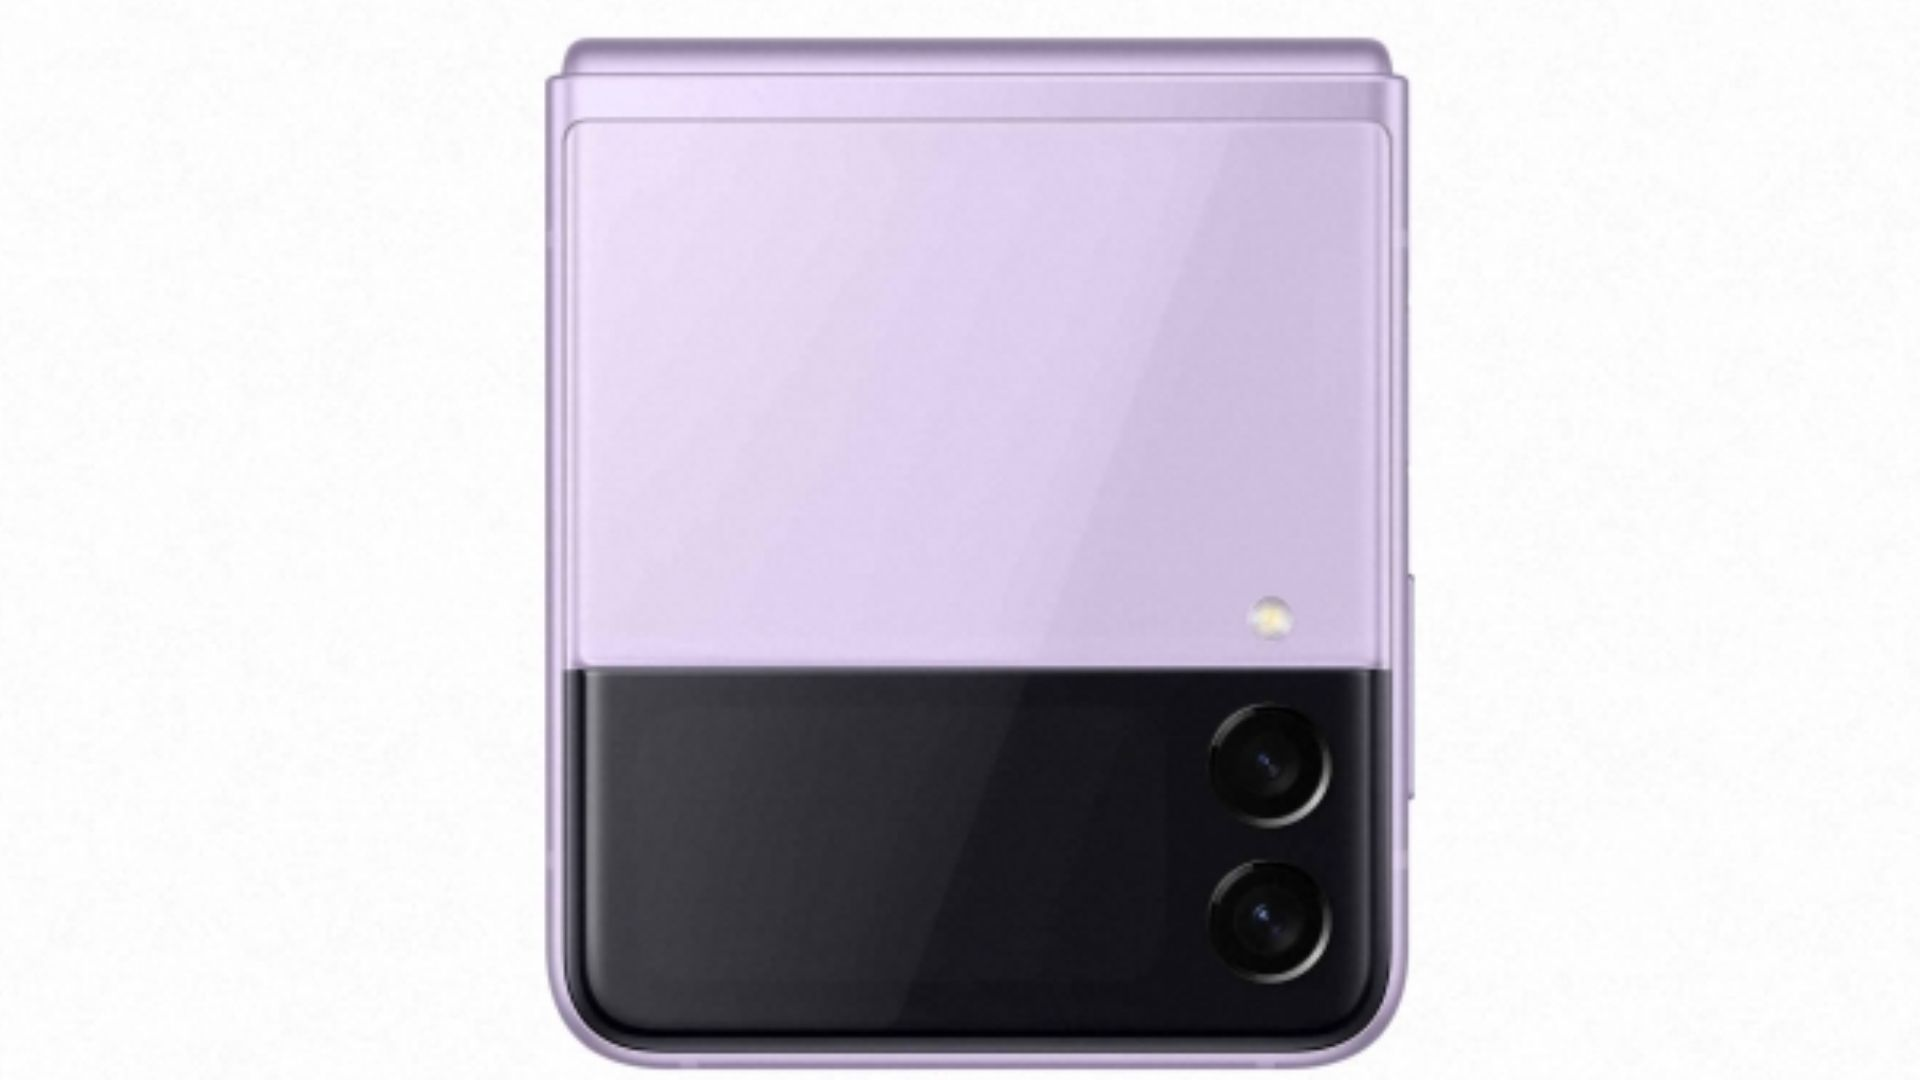 Celular Galaxy Z Flip 3 na cor violeta em fundo branco